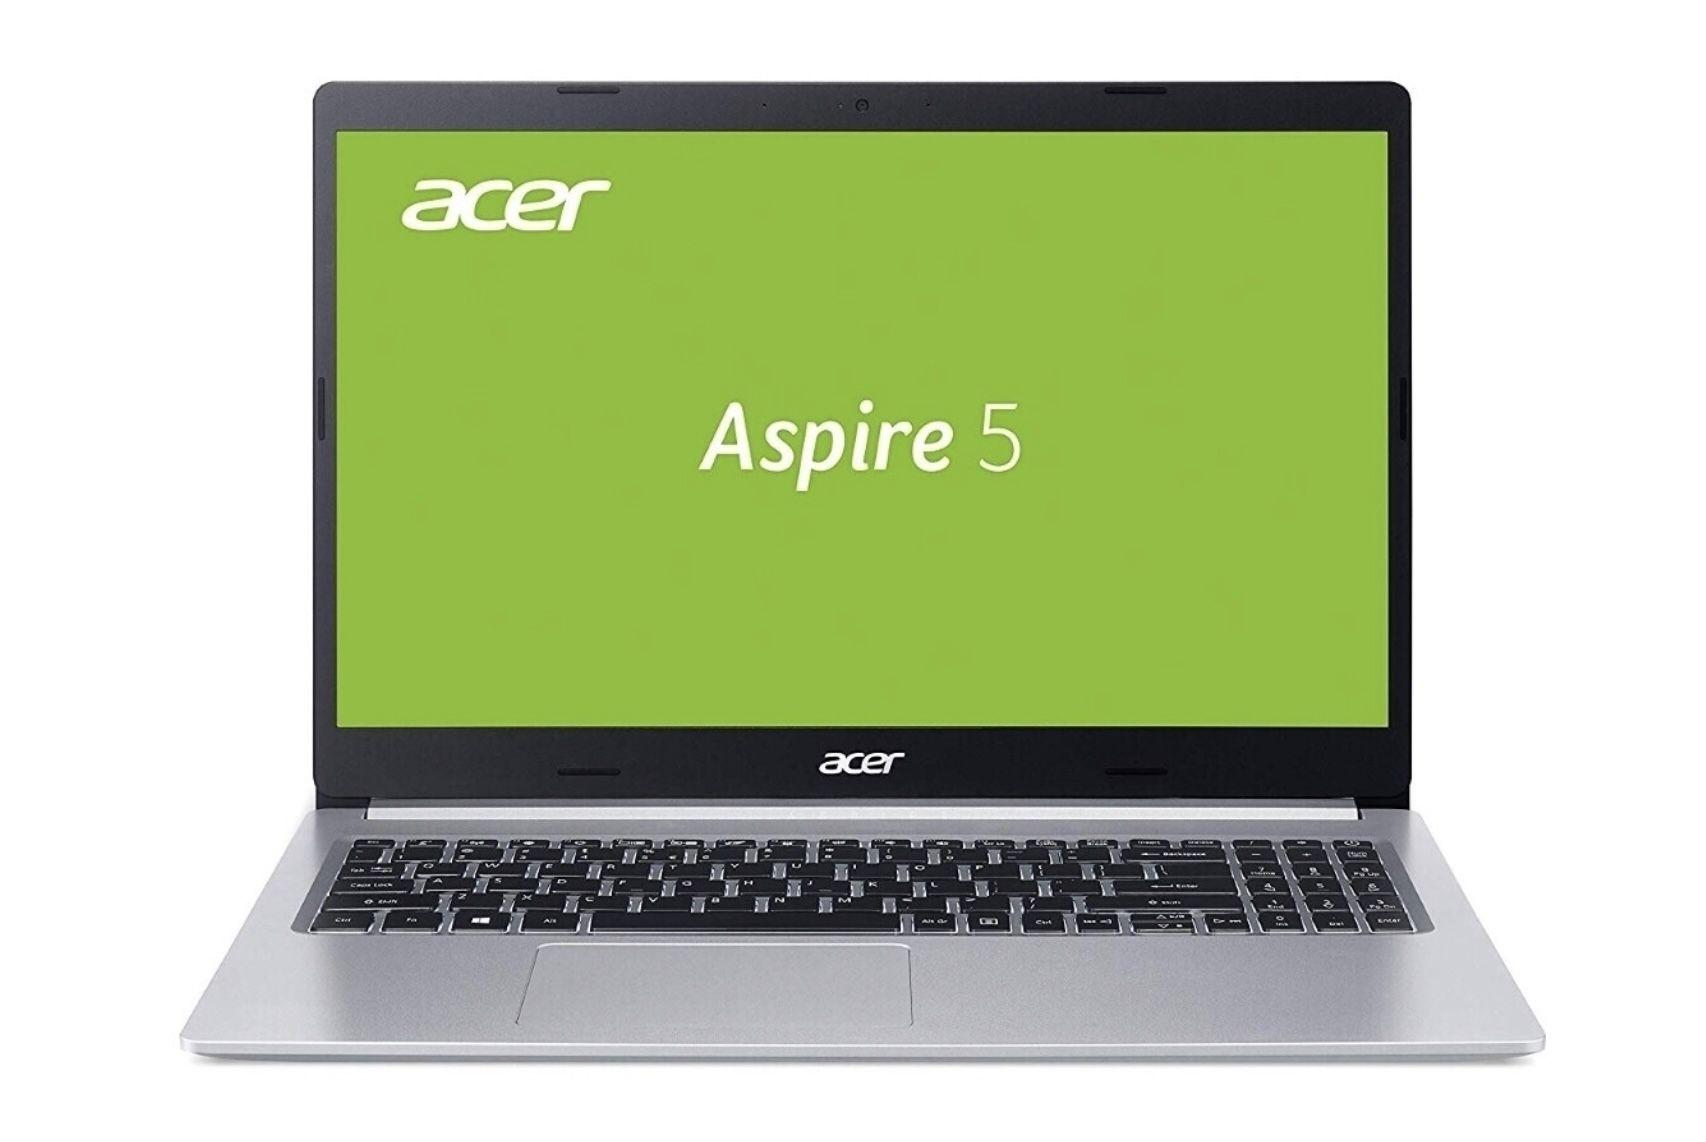 Acer Aspire 5 – 15,6 Zoll Multimedia Laptop mit 8 GB RAM & 512 GB SSD für 444€ (statt 499€)